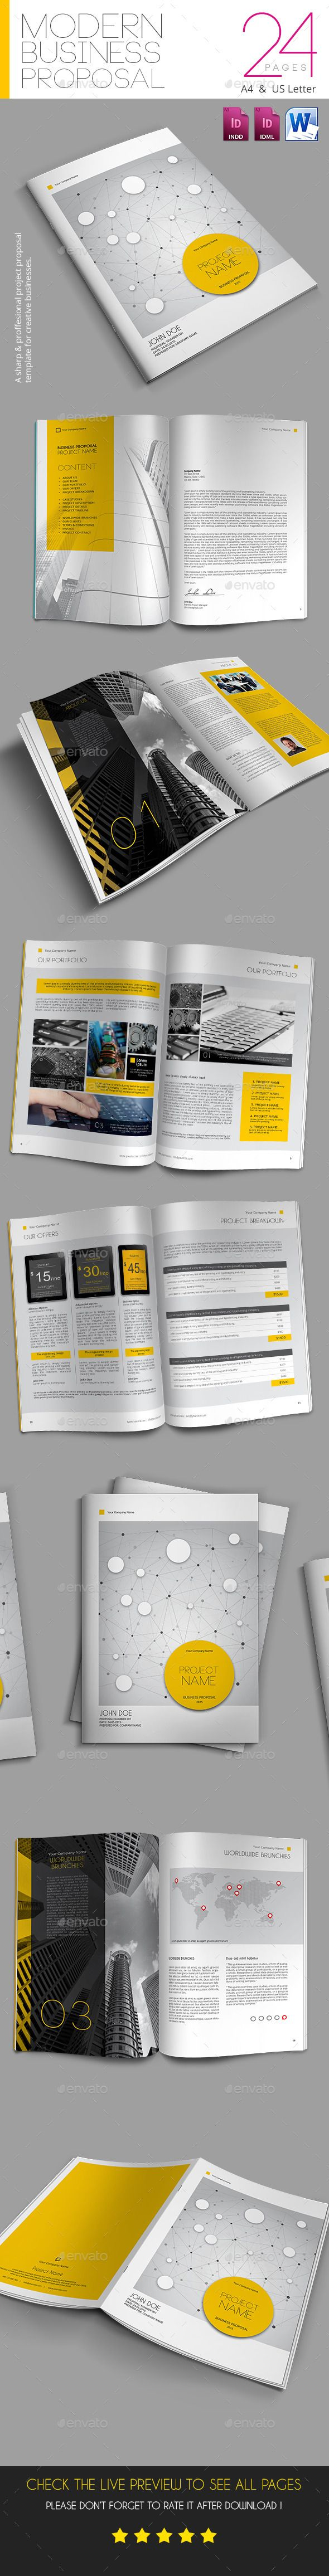 Modern Business Proposal – Business Proposal Download